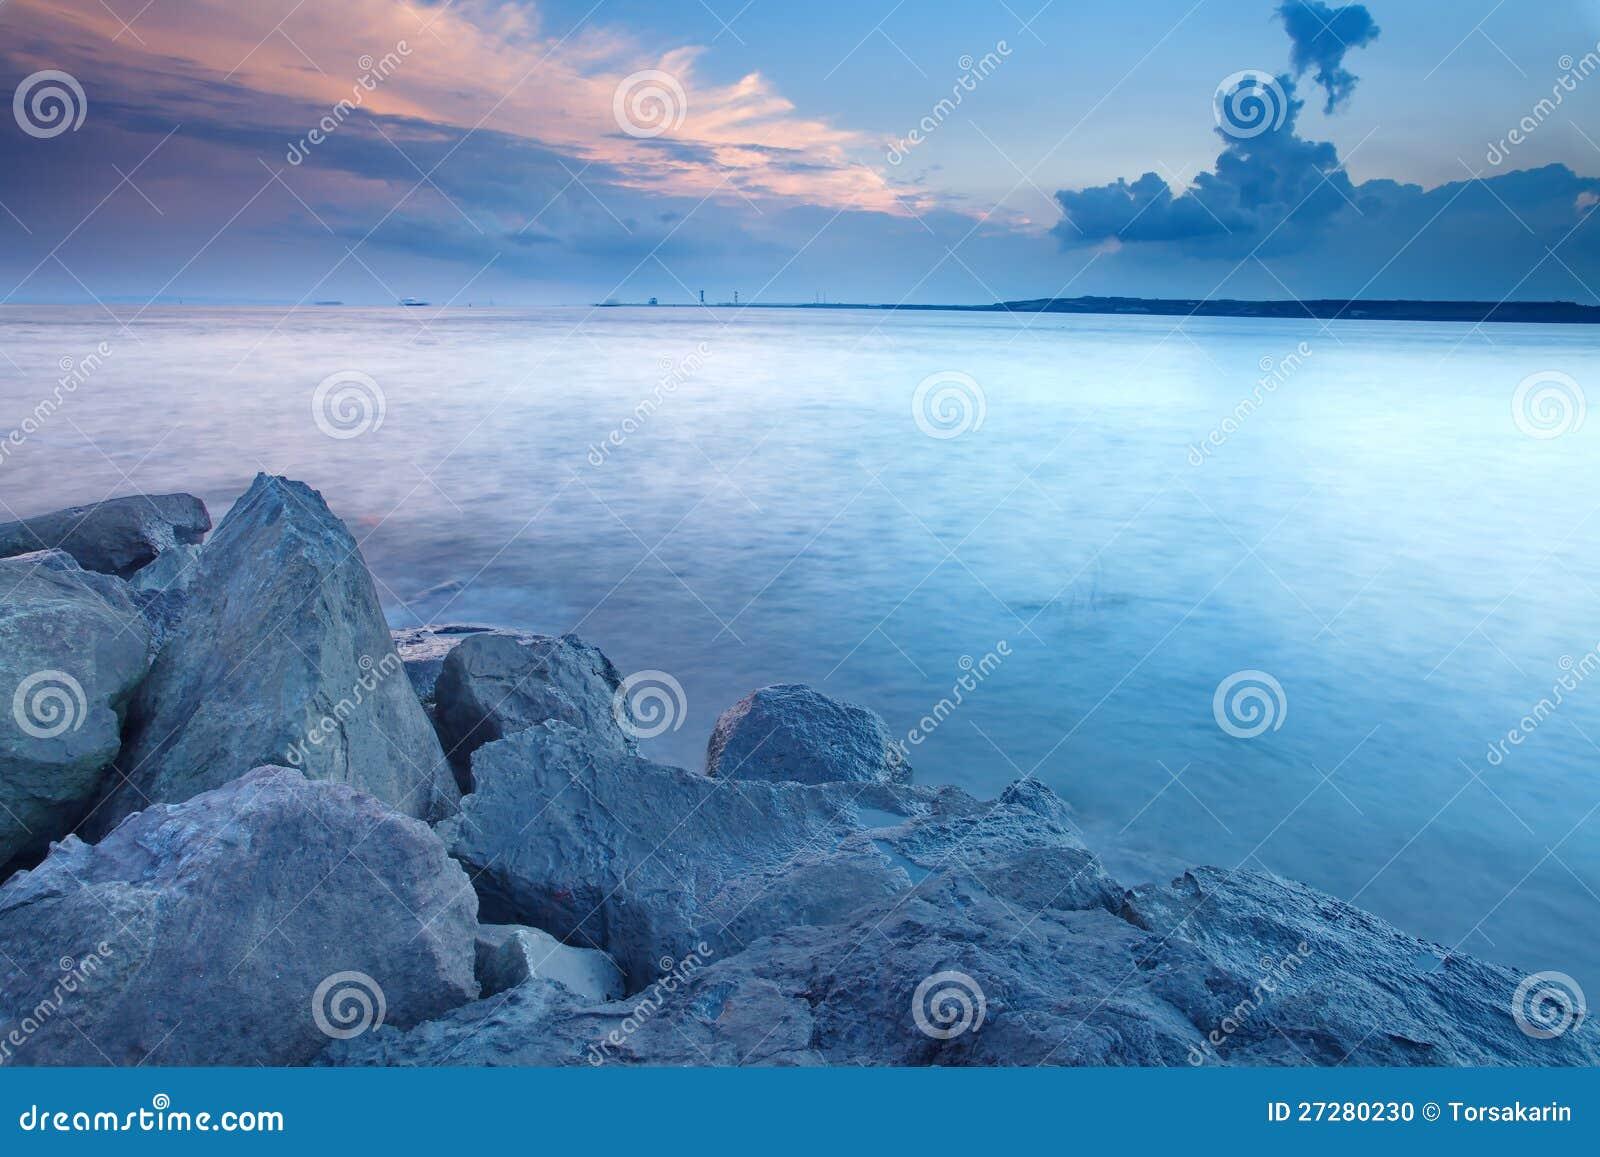 Japan seascape